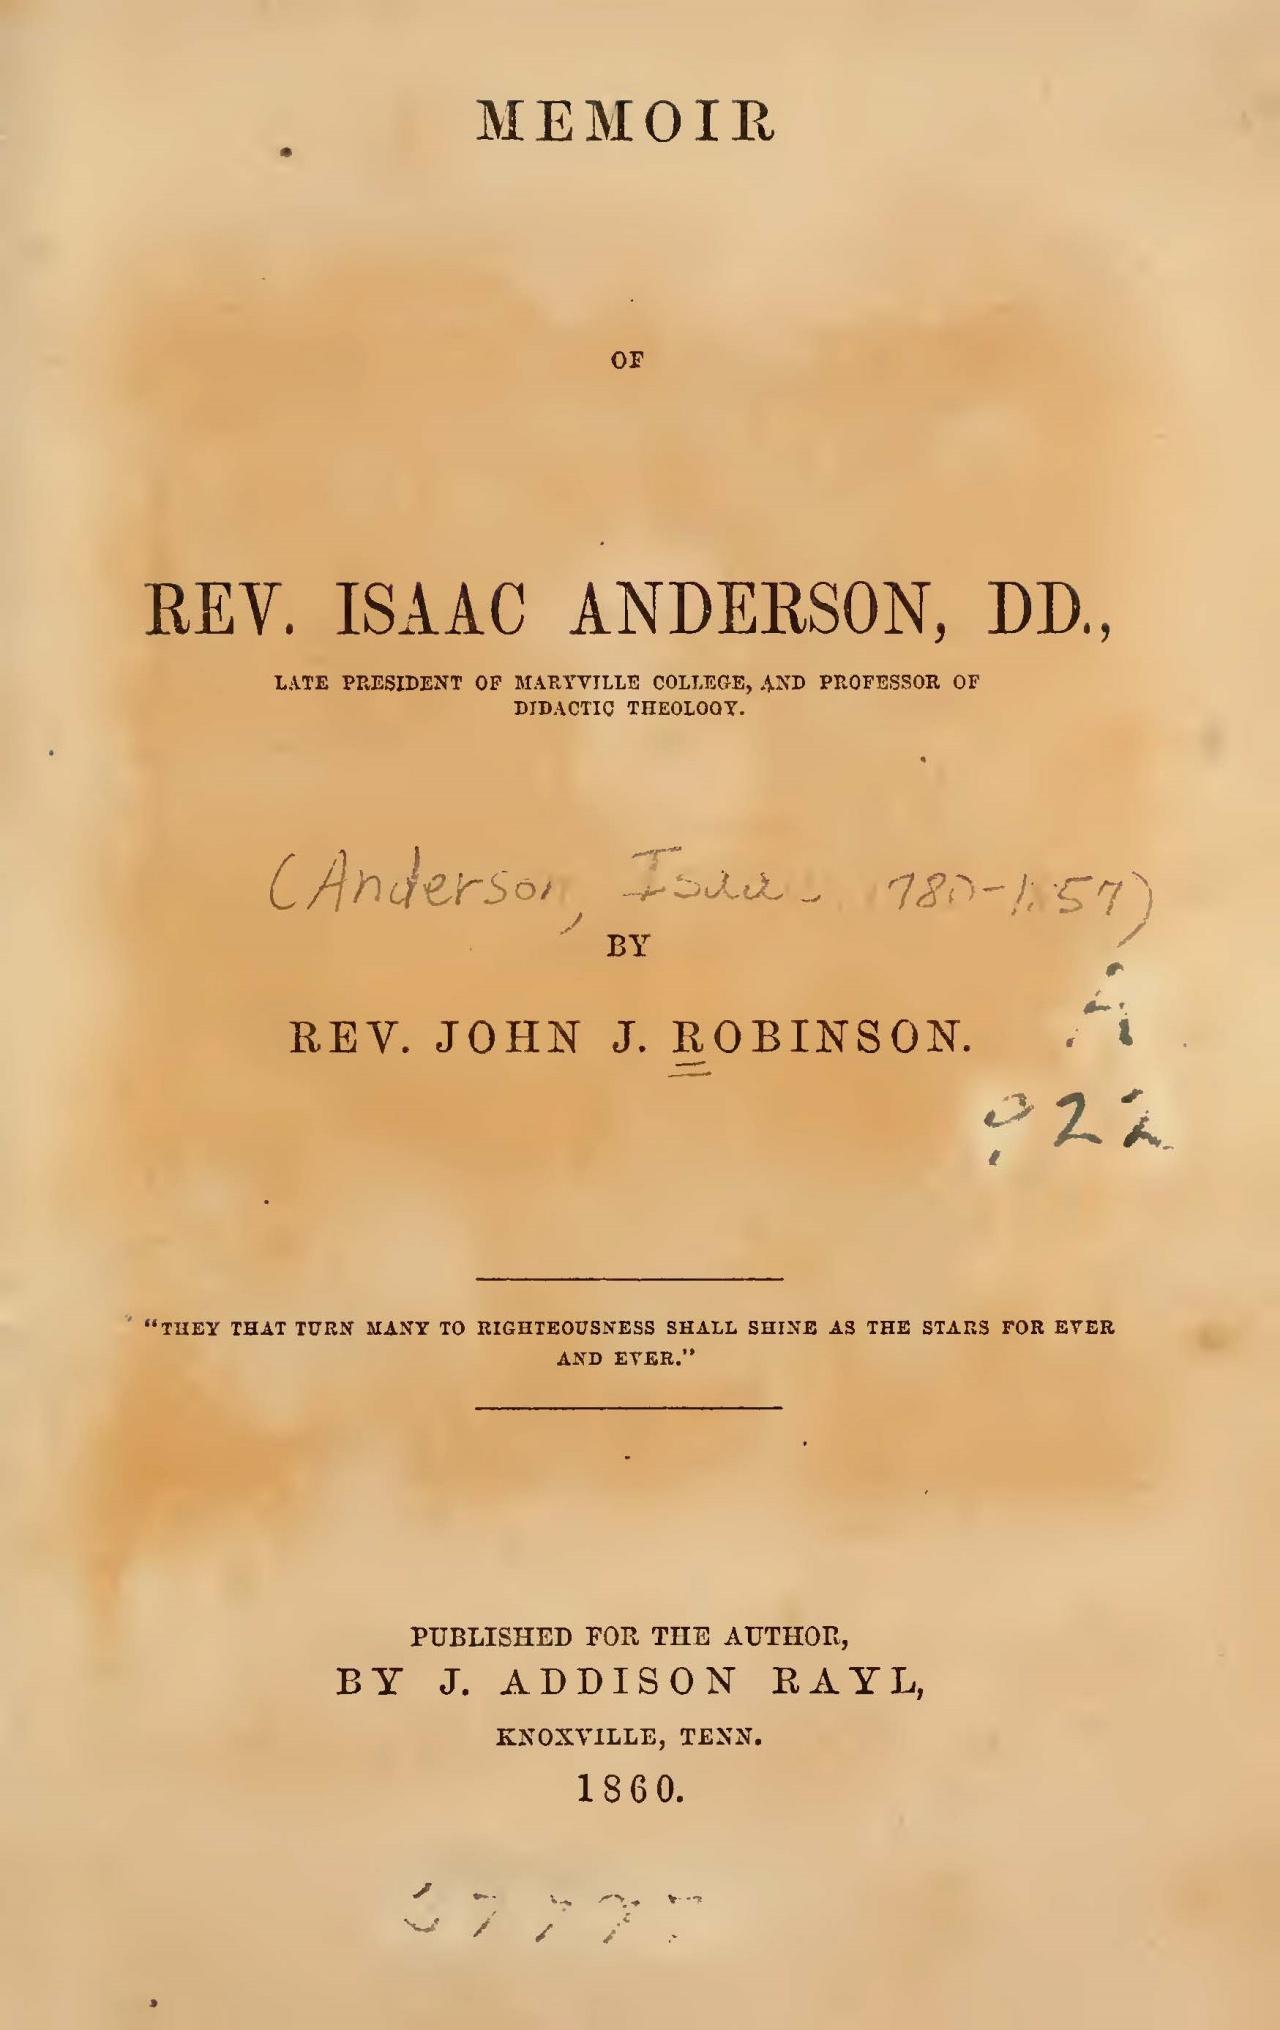 Robinson, John Joseph, Memoir of Rev. Isaac Anderson, D.D. Title Page.jpg